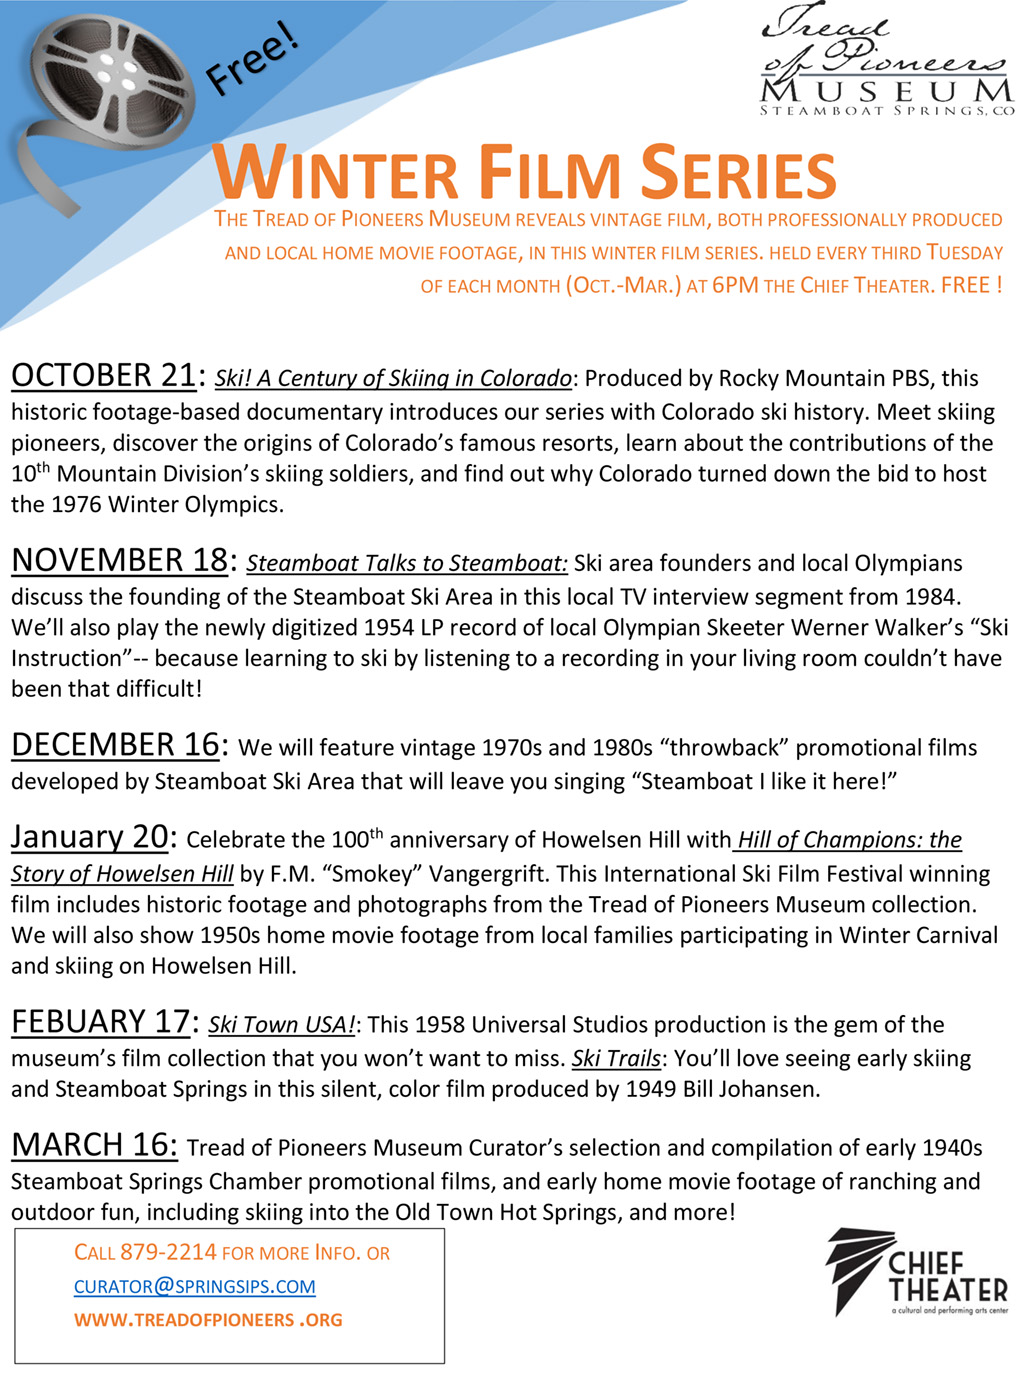 ski town usa, steamboat springs, film series, ski colorado